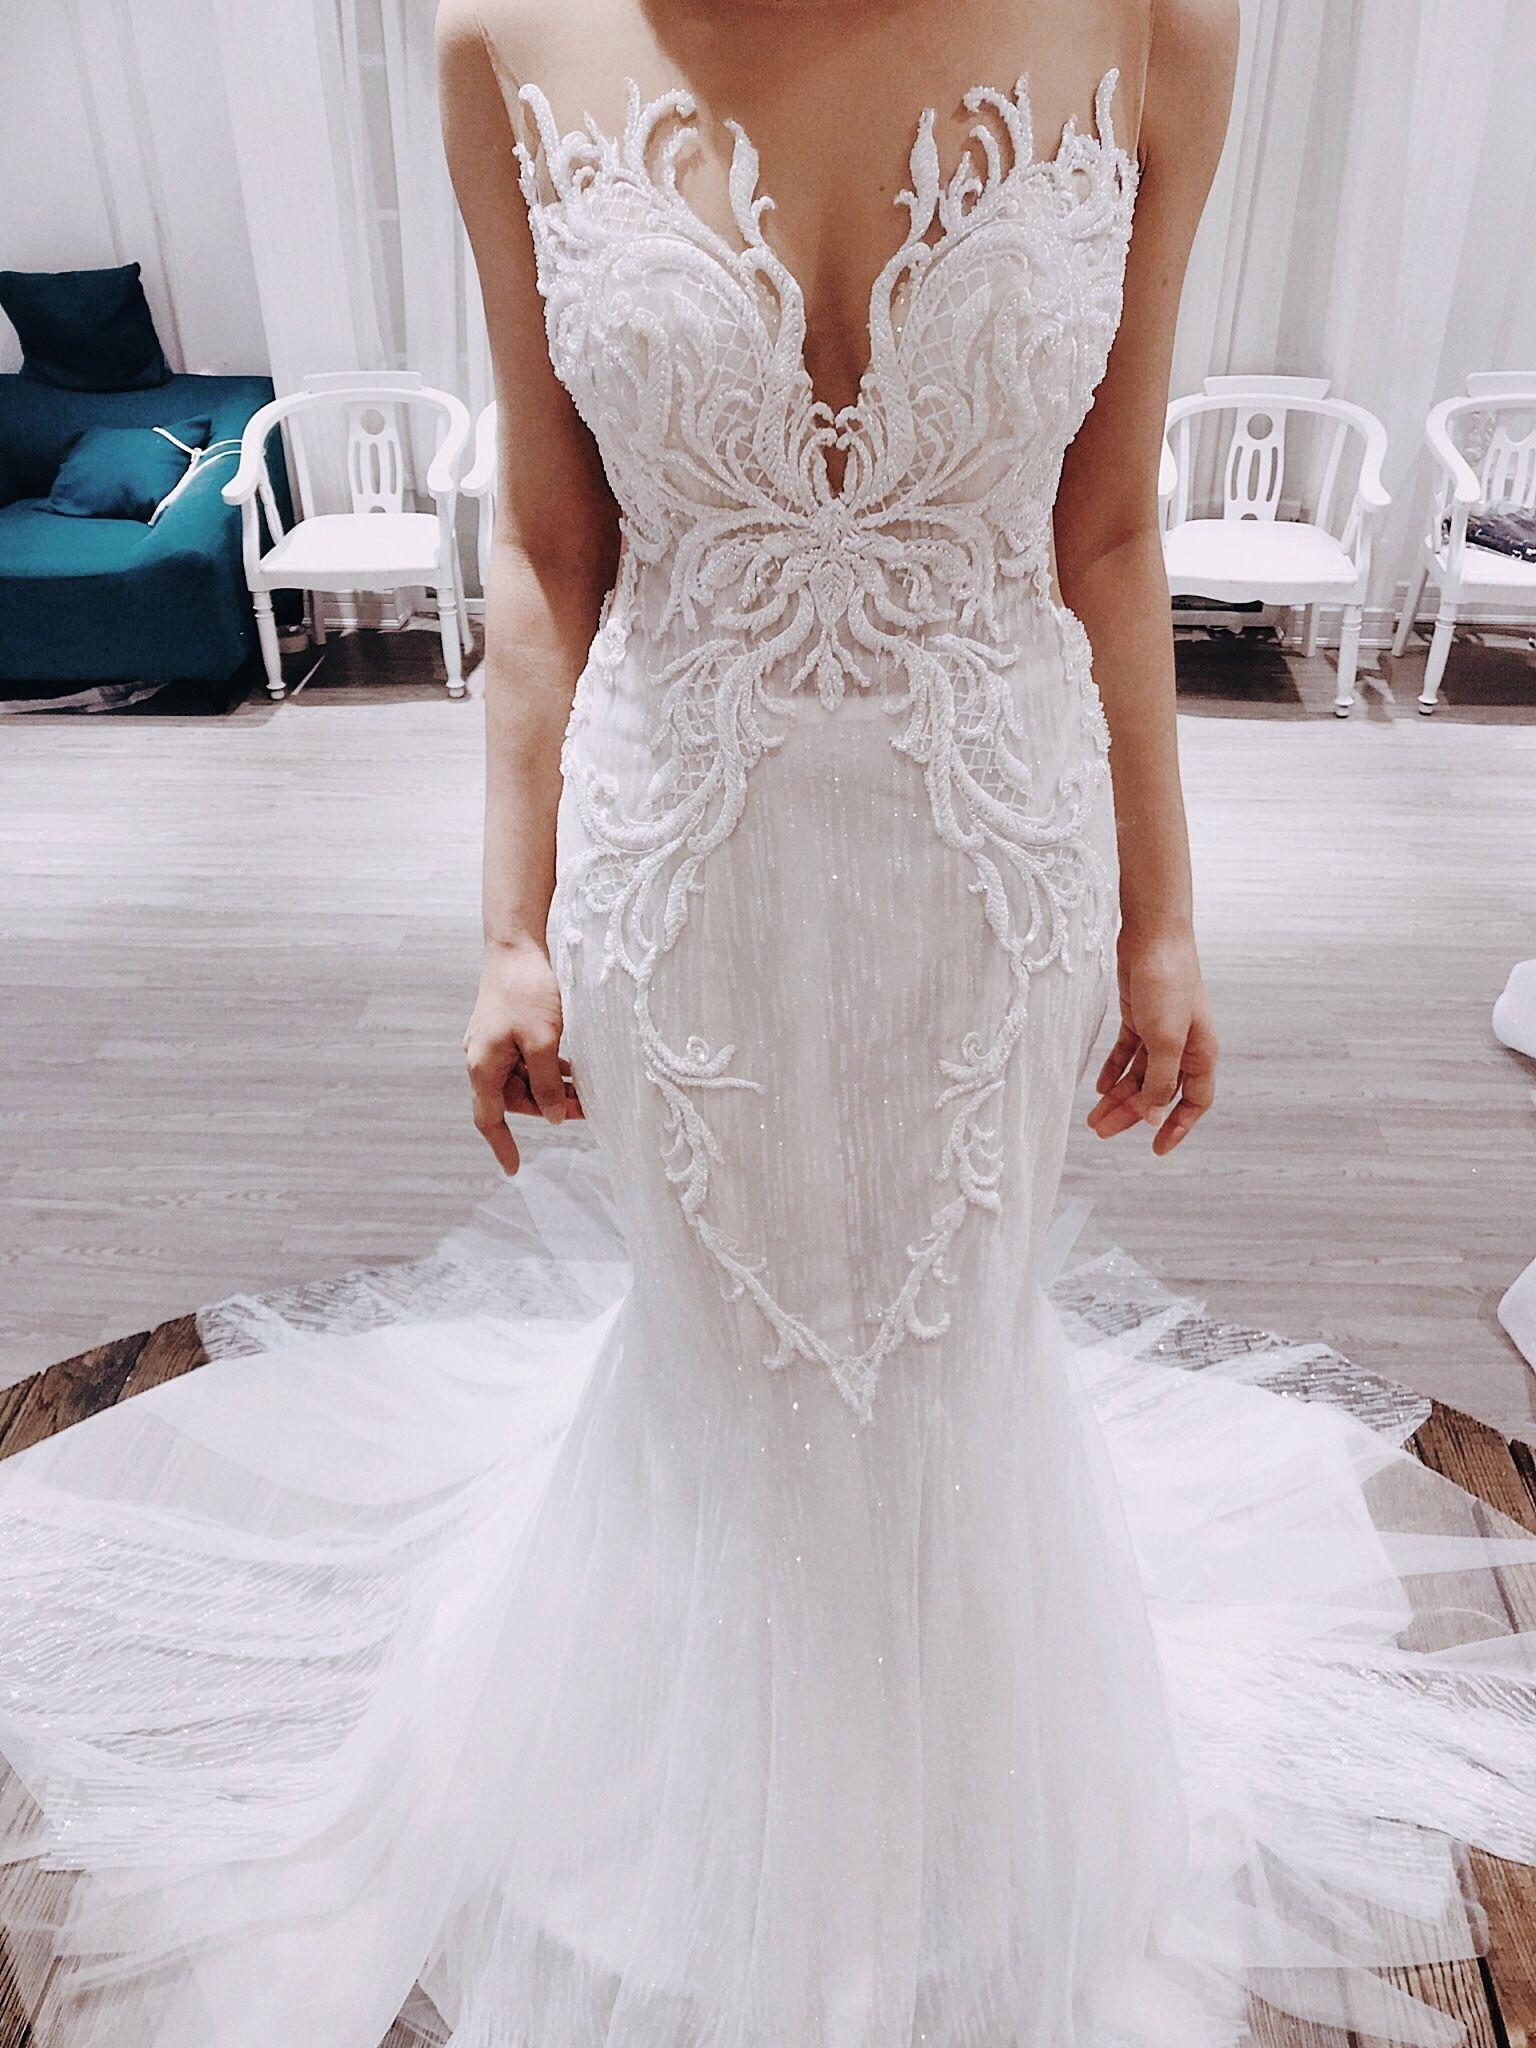 Arico Sparkly Mermaid Wedding Dress With Backless Long Etsy Embroidered Wedding Dress Wedding Dresses Unique Wedding Dresses [ 2048 x 1536 Pixel ]